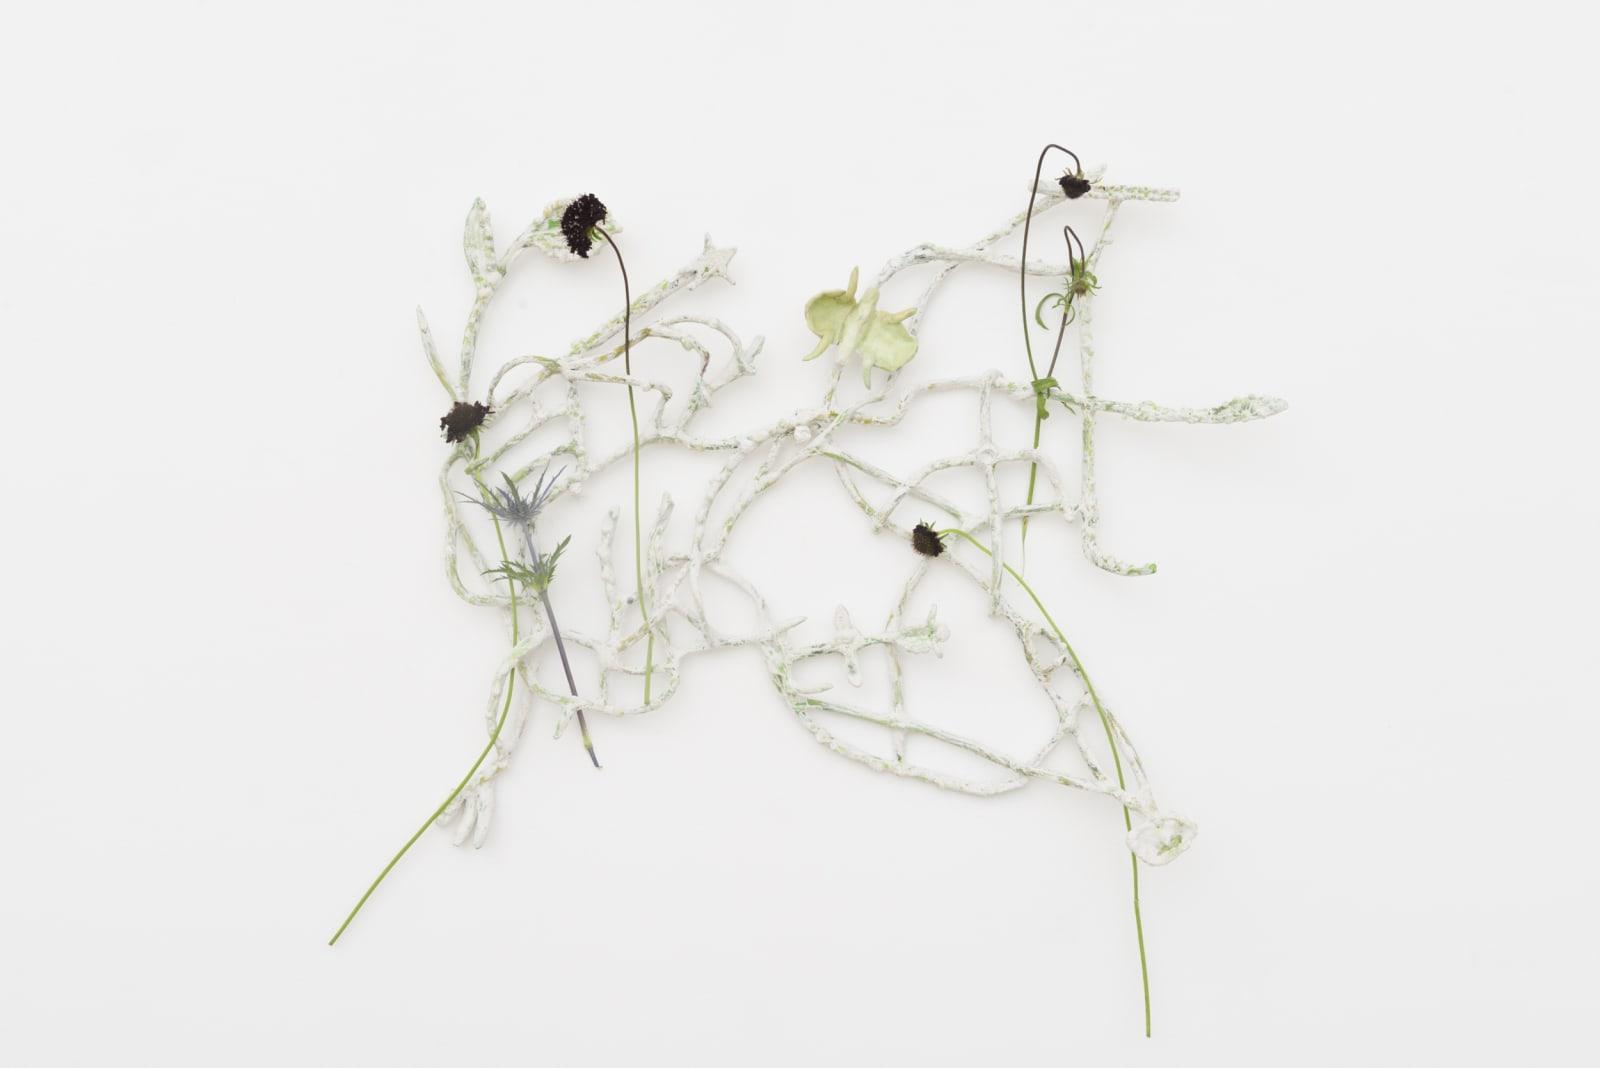 ASMA, Blossoming Carcass, 2019